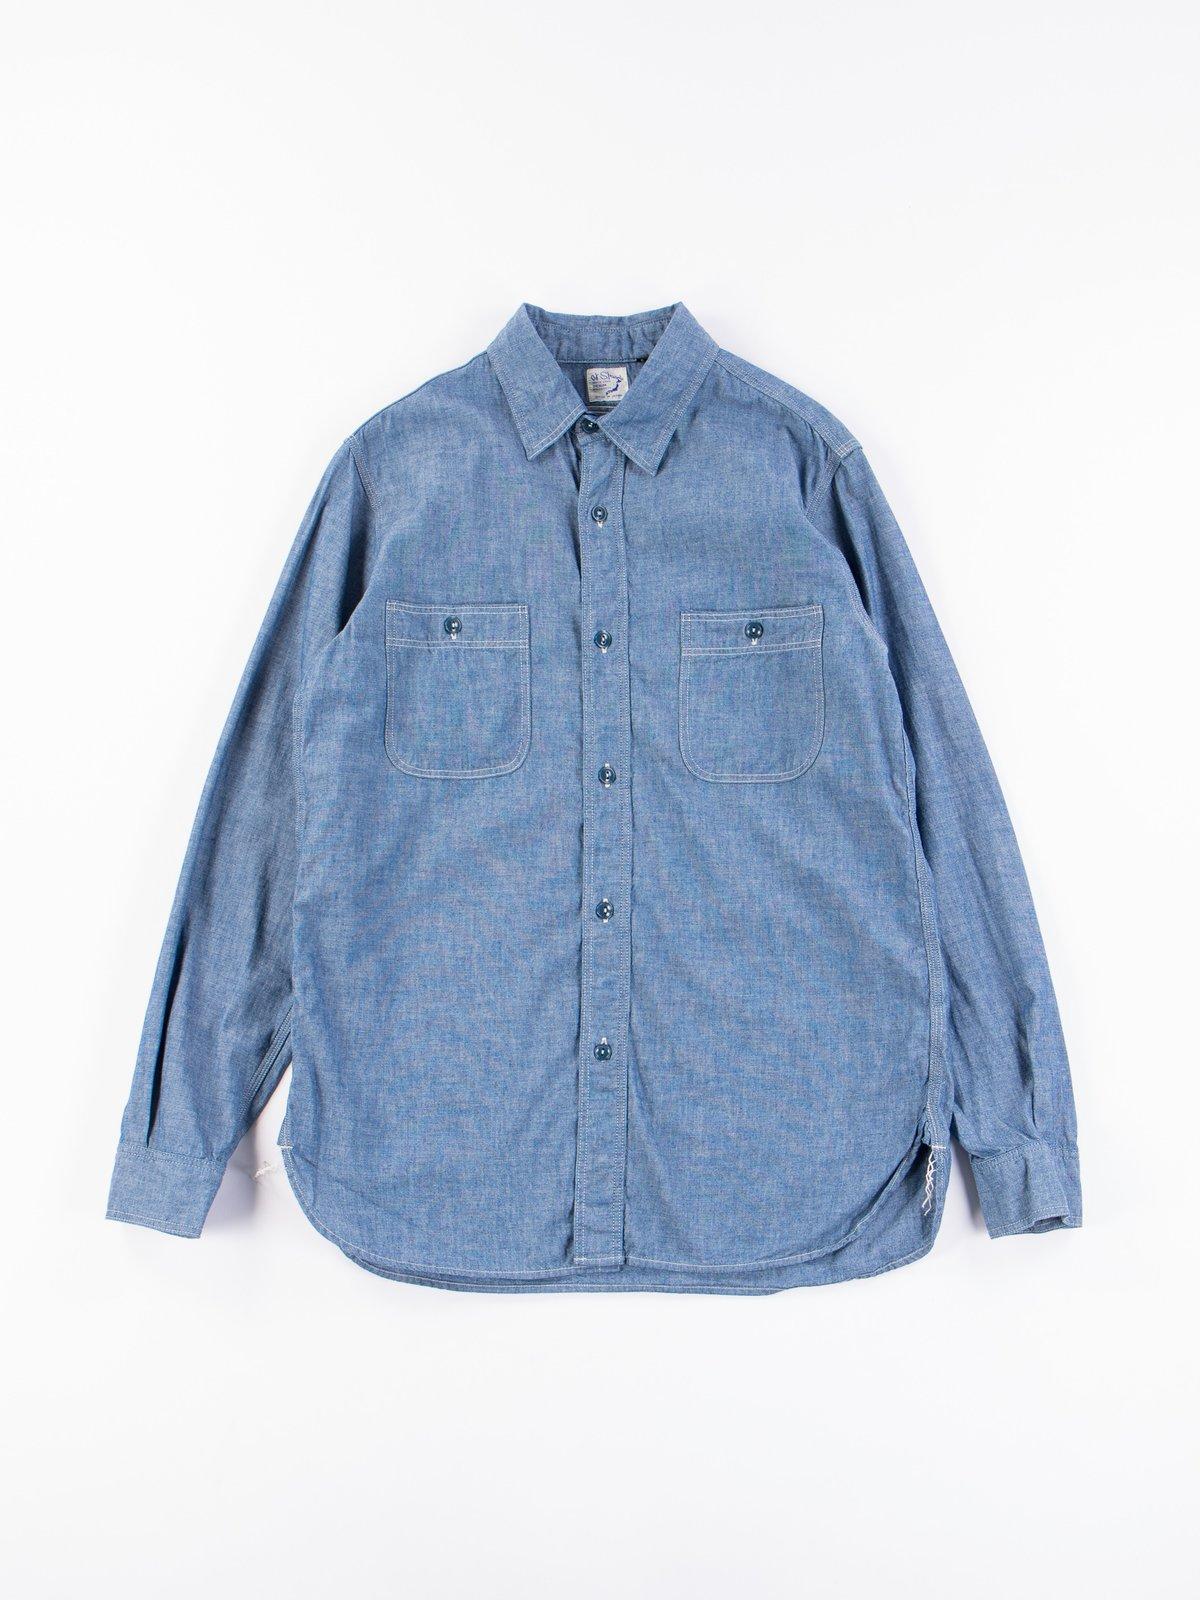 Blue Chambray Work Shirt - Image 1